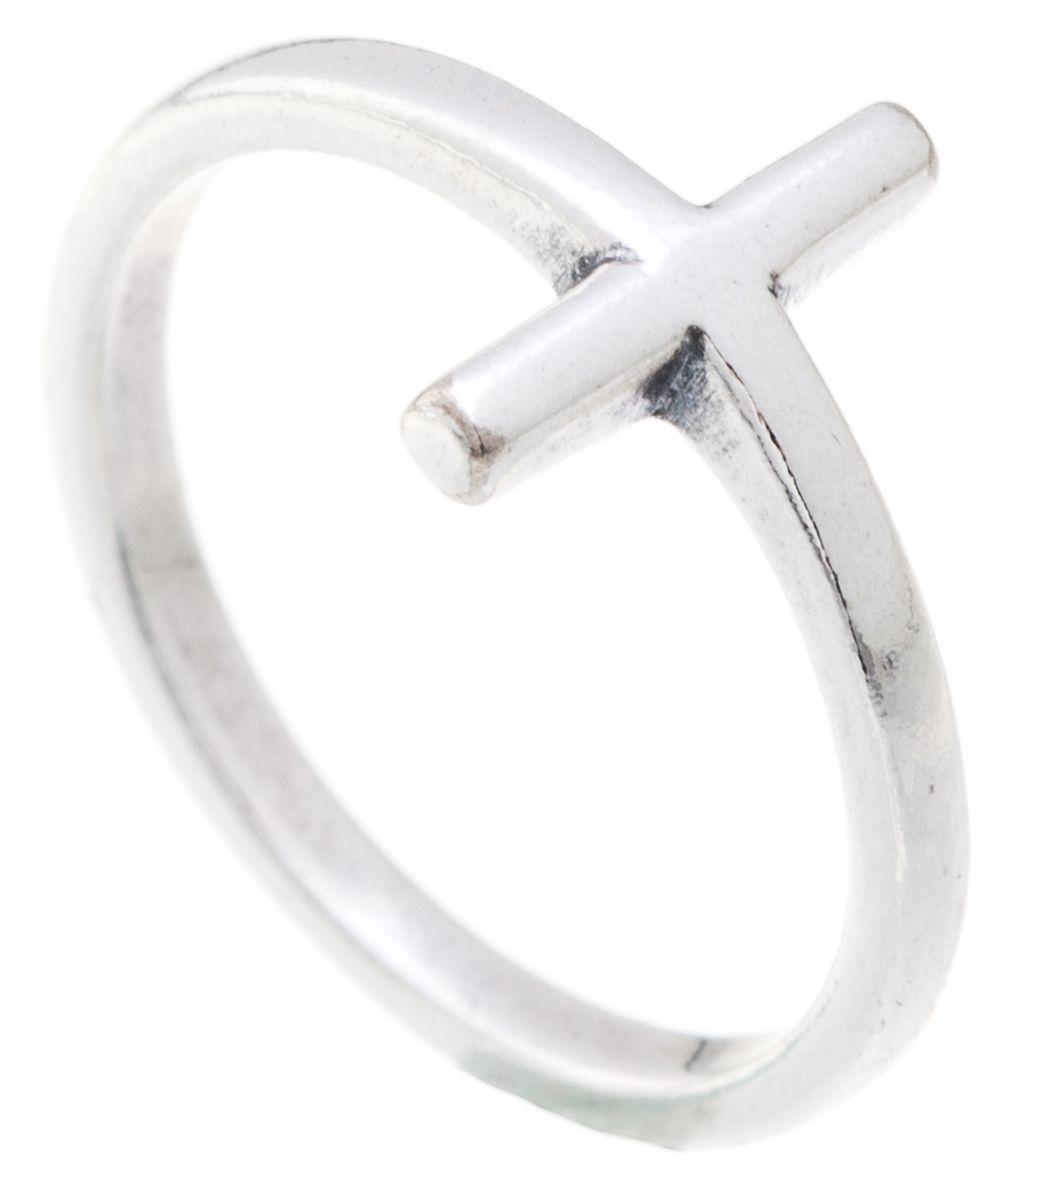 Jenavi, Коллекция Young 2, Рёдер (Кольцо), цвет - серебро, , размер - 15 ( f6543090 )